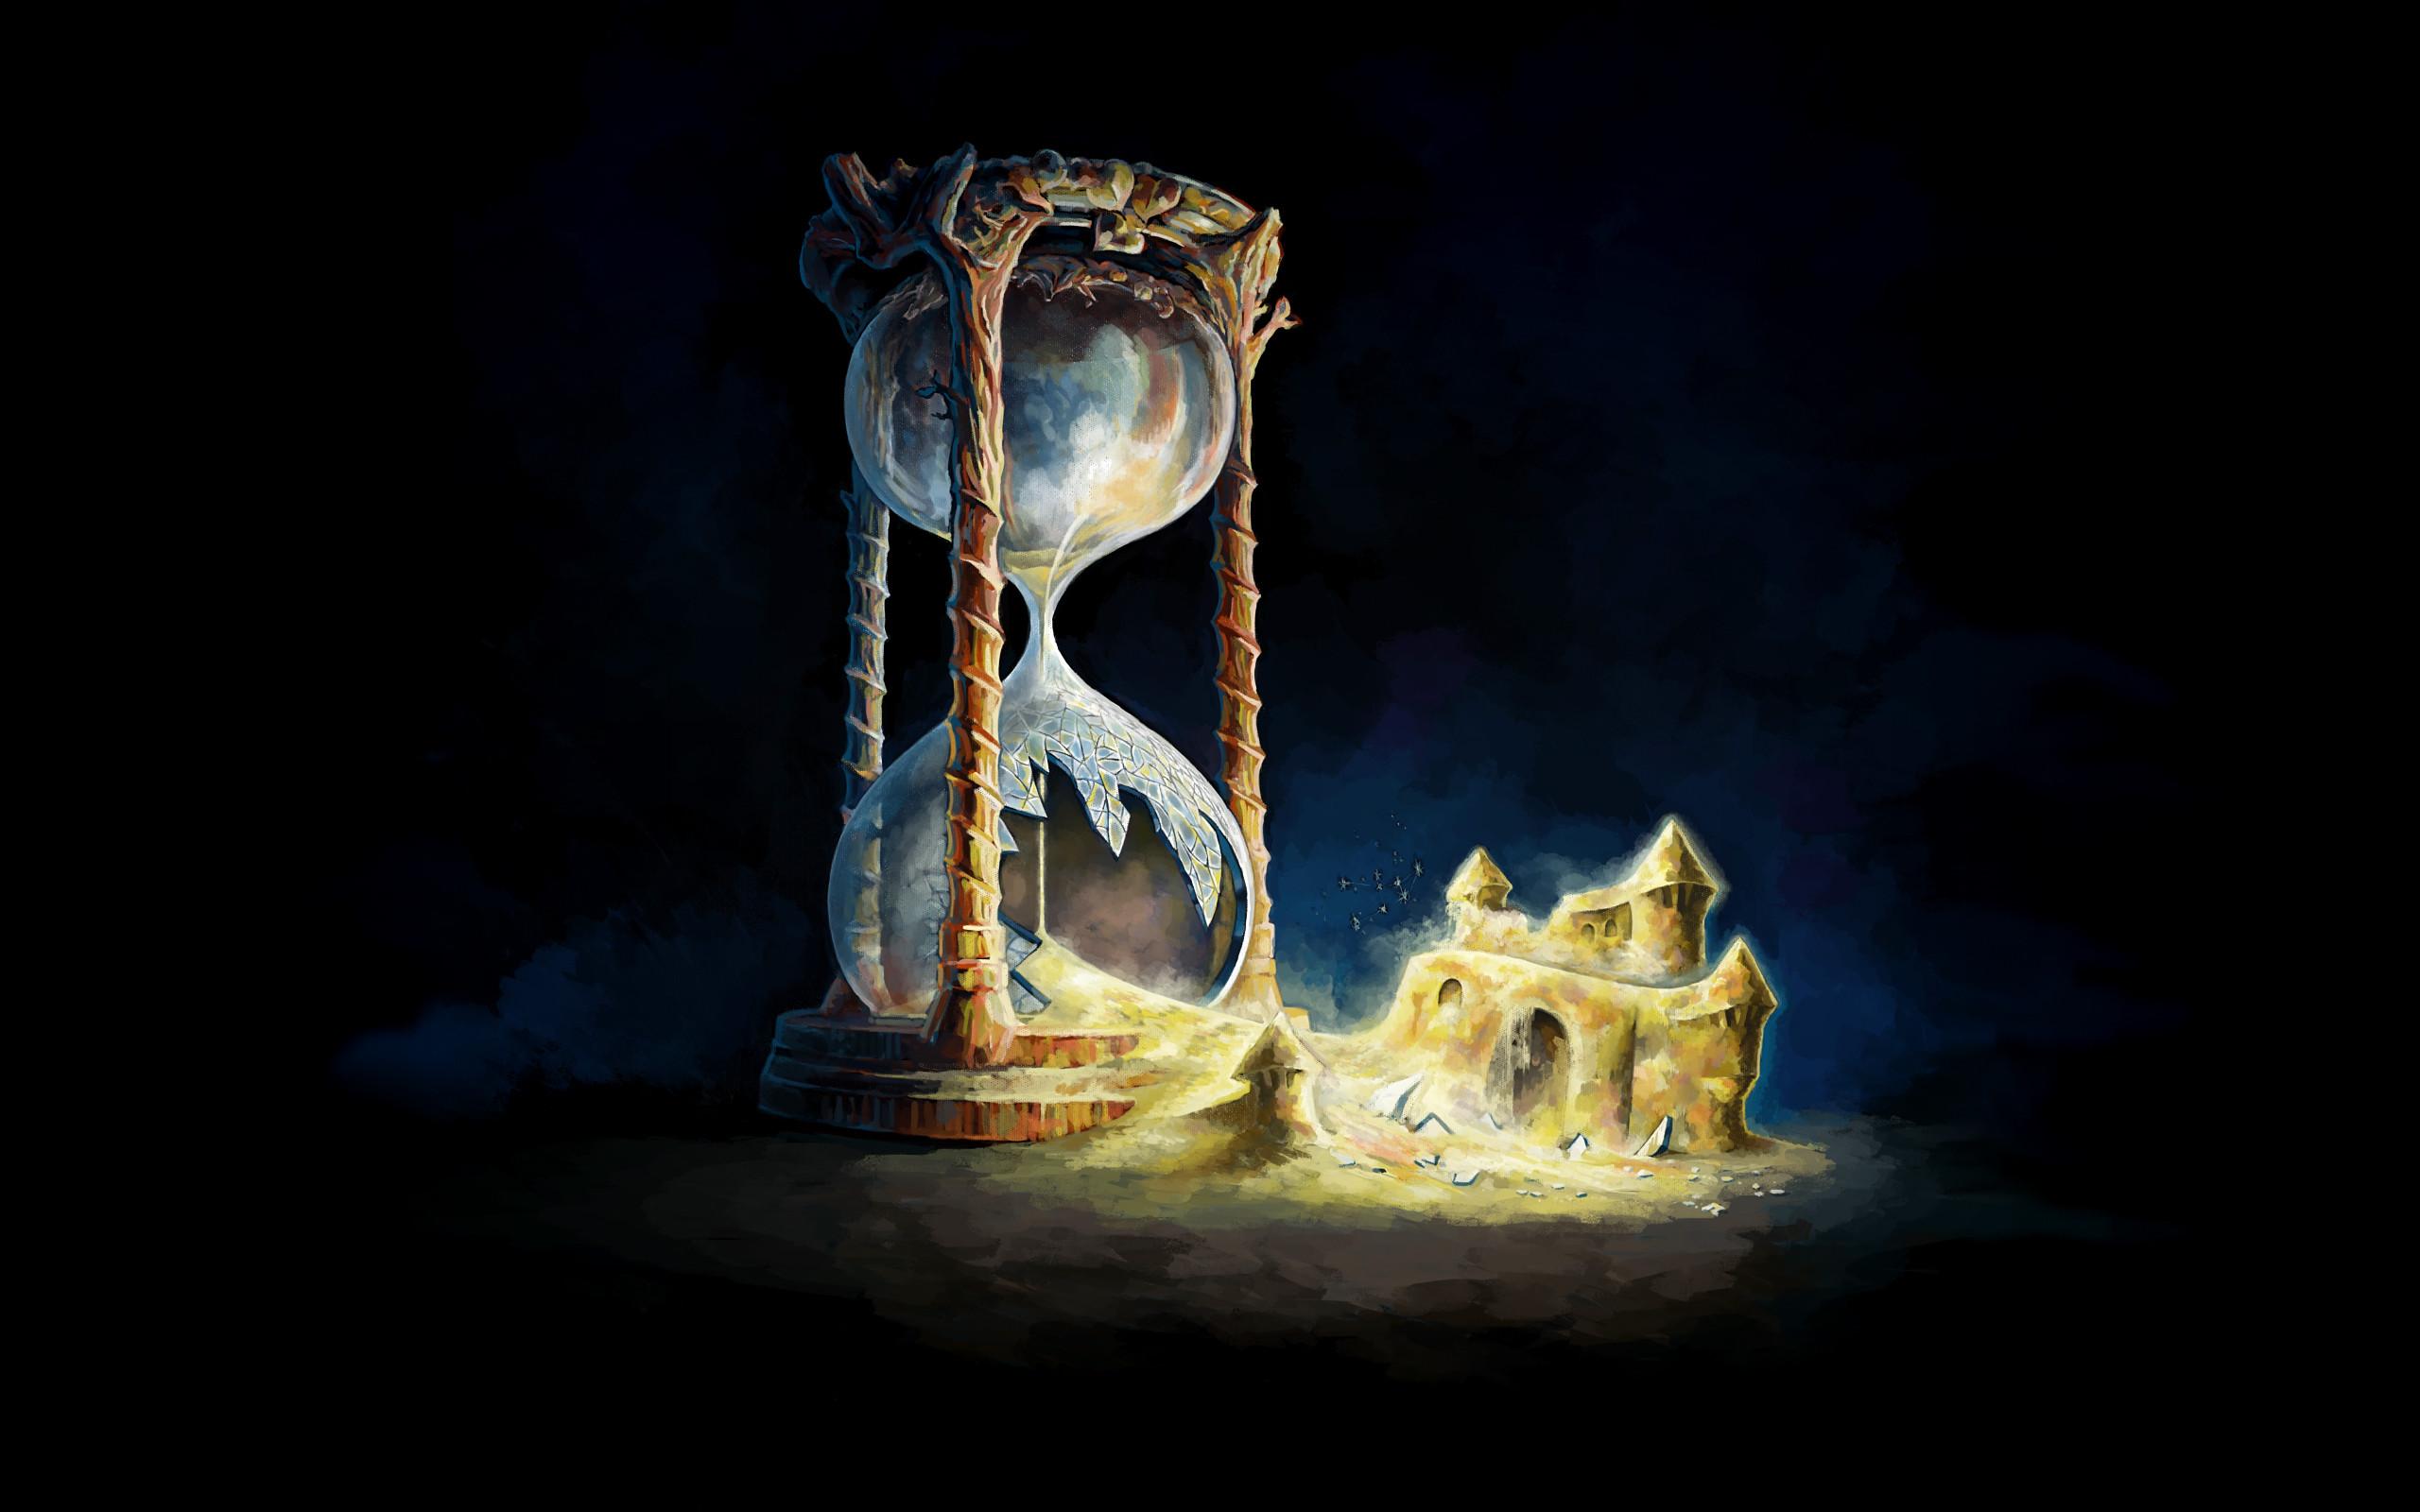 Hourglass Wallpaper 2560x1600